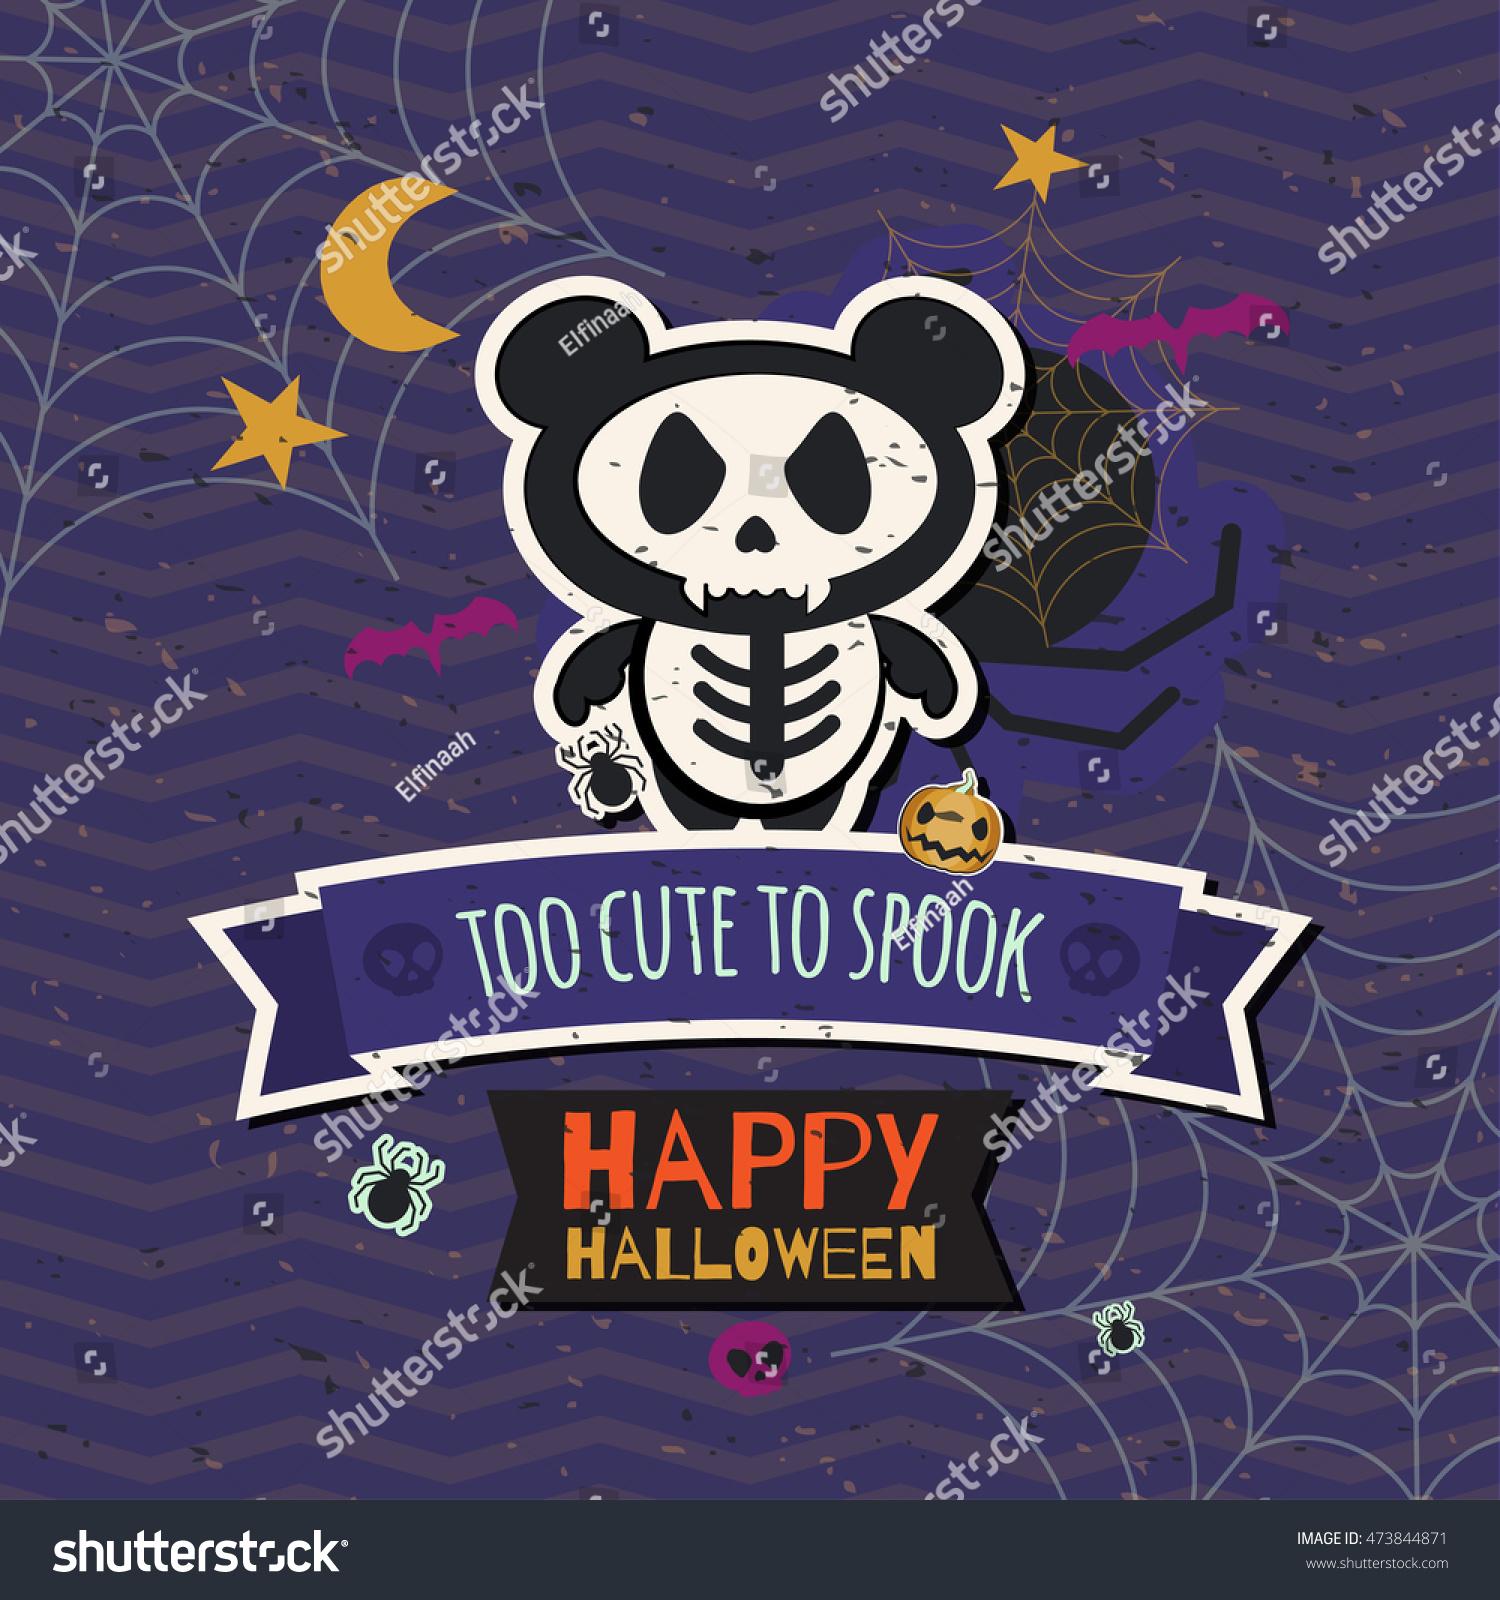 Must see Wallpaper Halloween Skull - stock-vector-happy-halloween-wallpaper-poster-card-badge-decoration-cute-scary-skeleton-panda-473844871  2018_512359.jpg